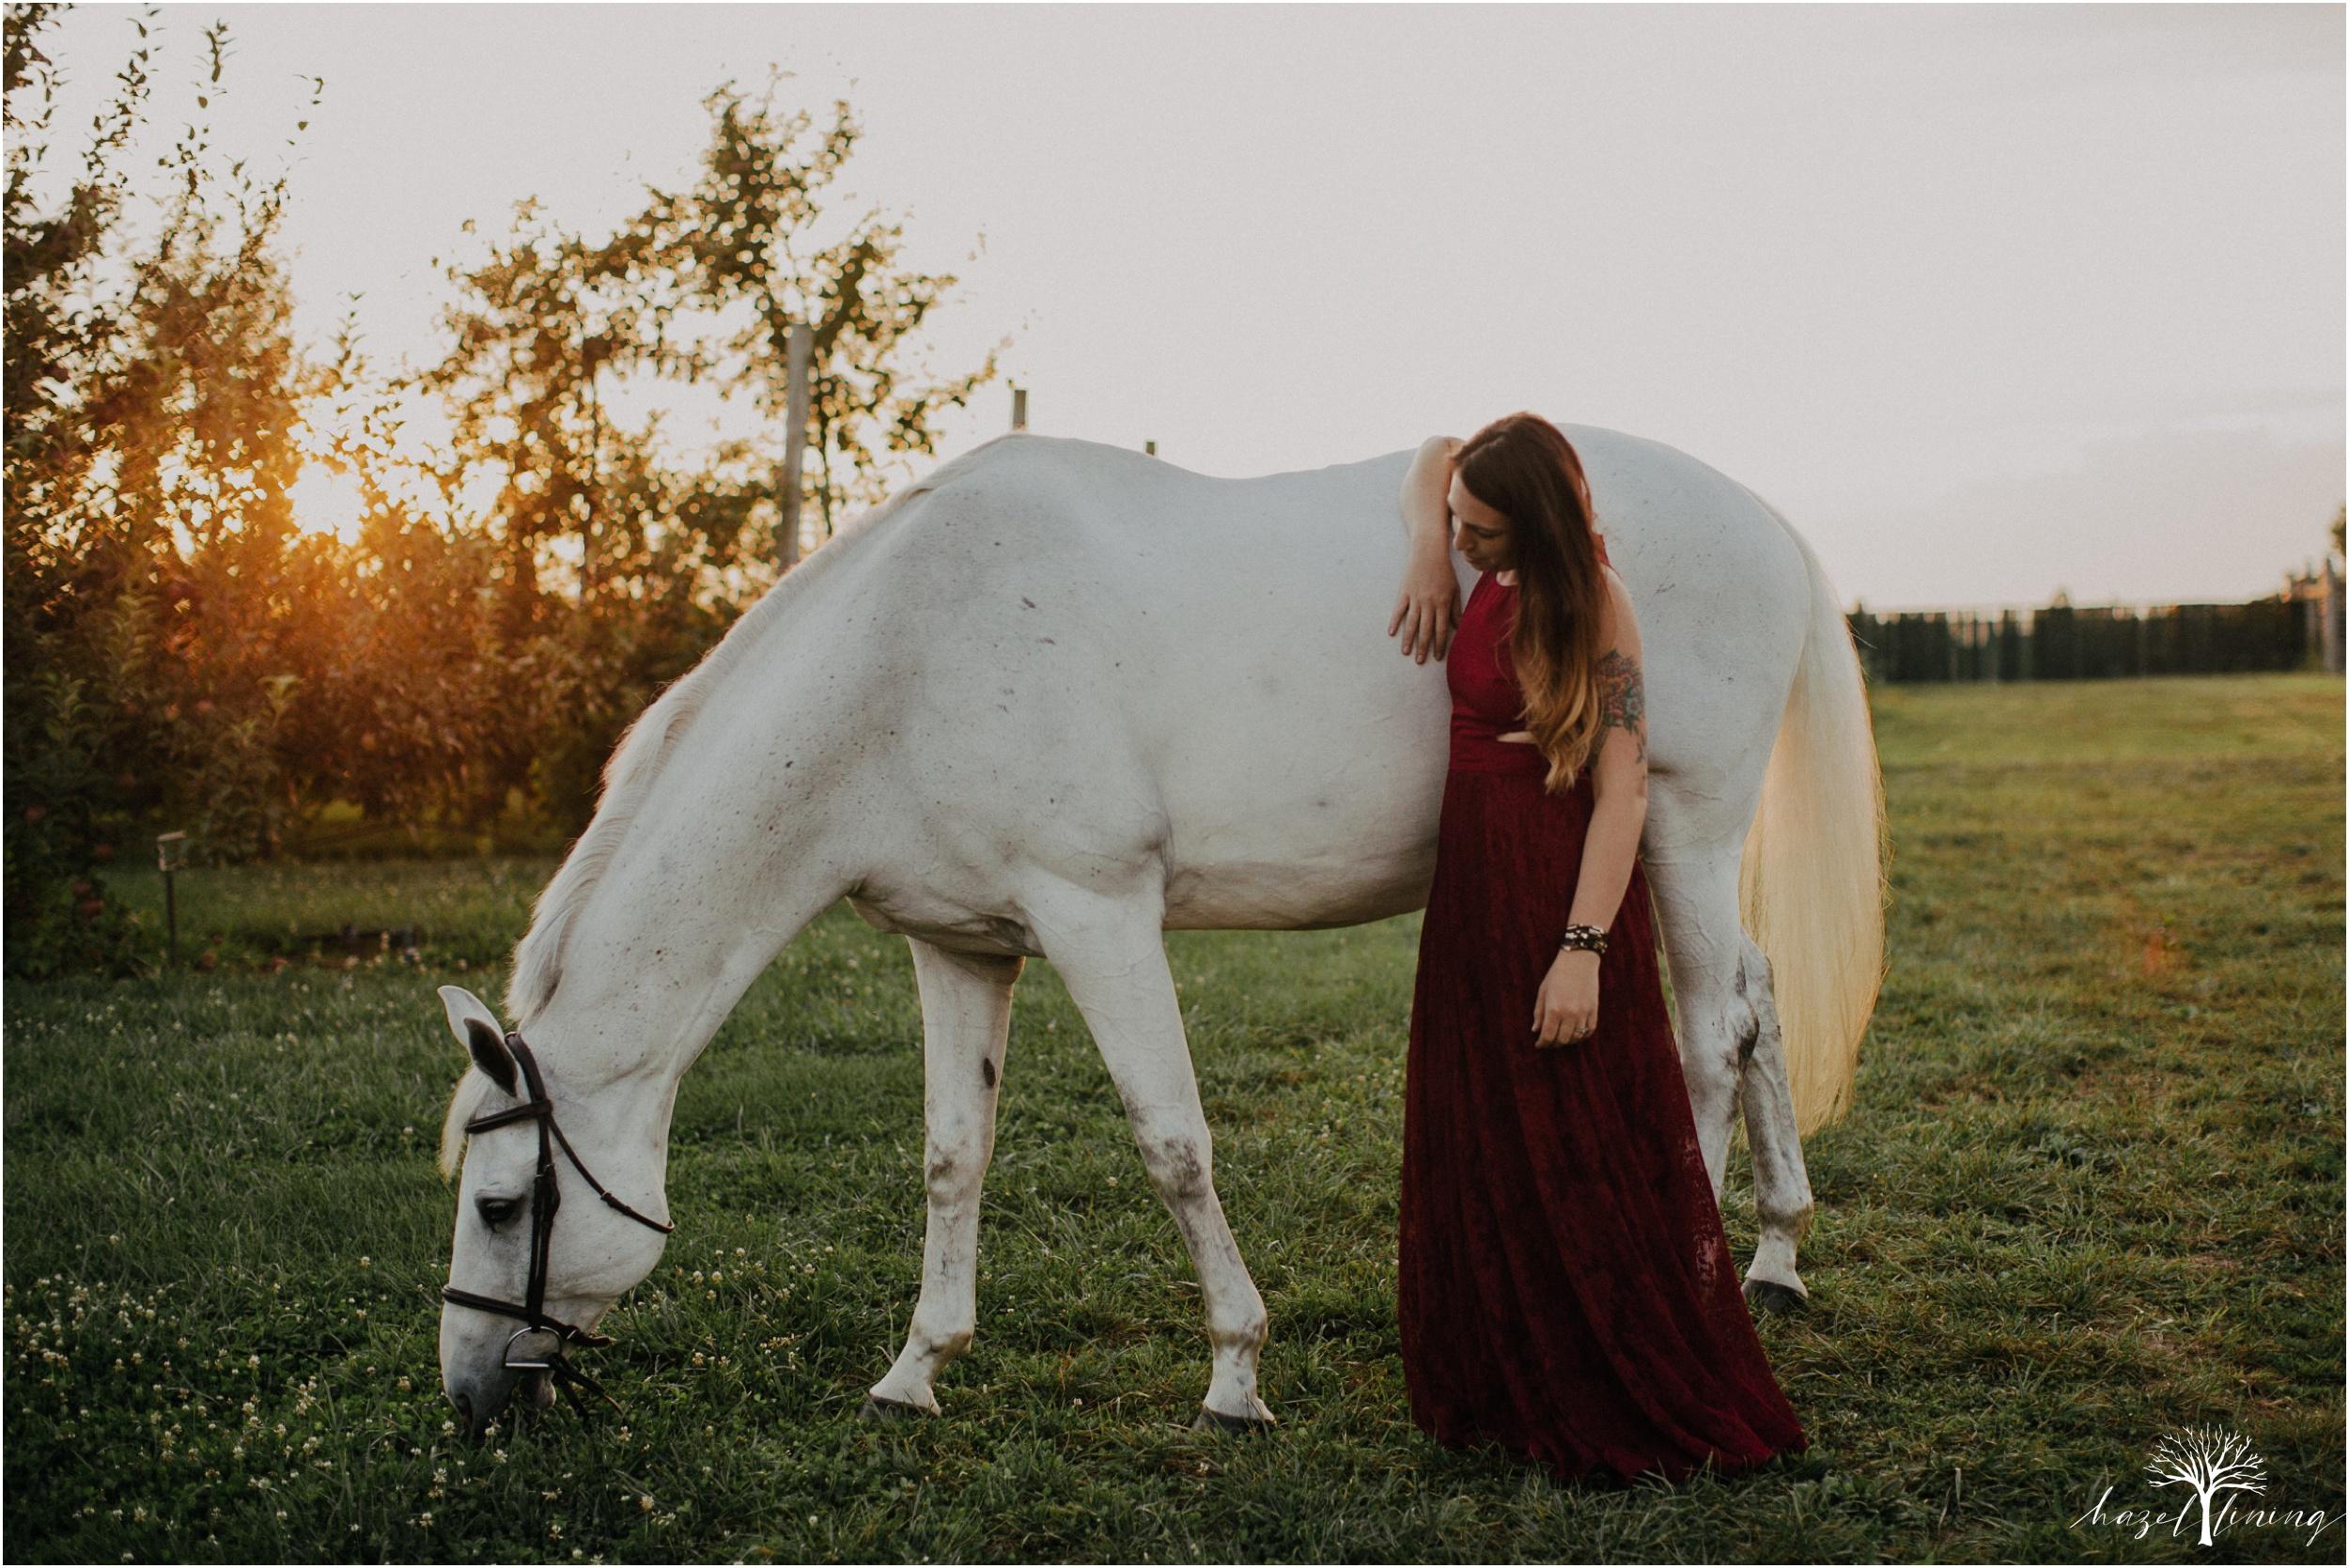 taylor-adams-and-horse-delaware-valley-university-delval-summer-equestrian-portrait-session-hazel-lining-photography-destination-elopement-wedding-engagement-photography_0074.jpg